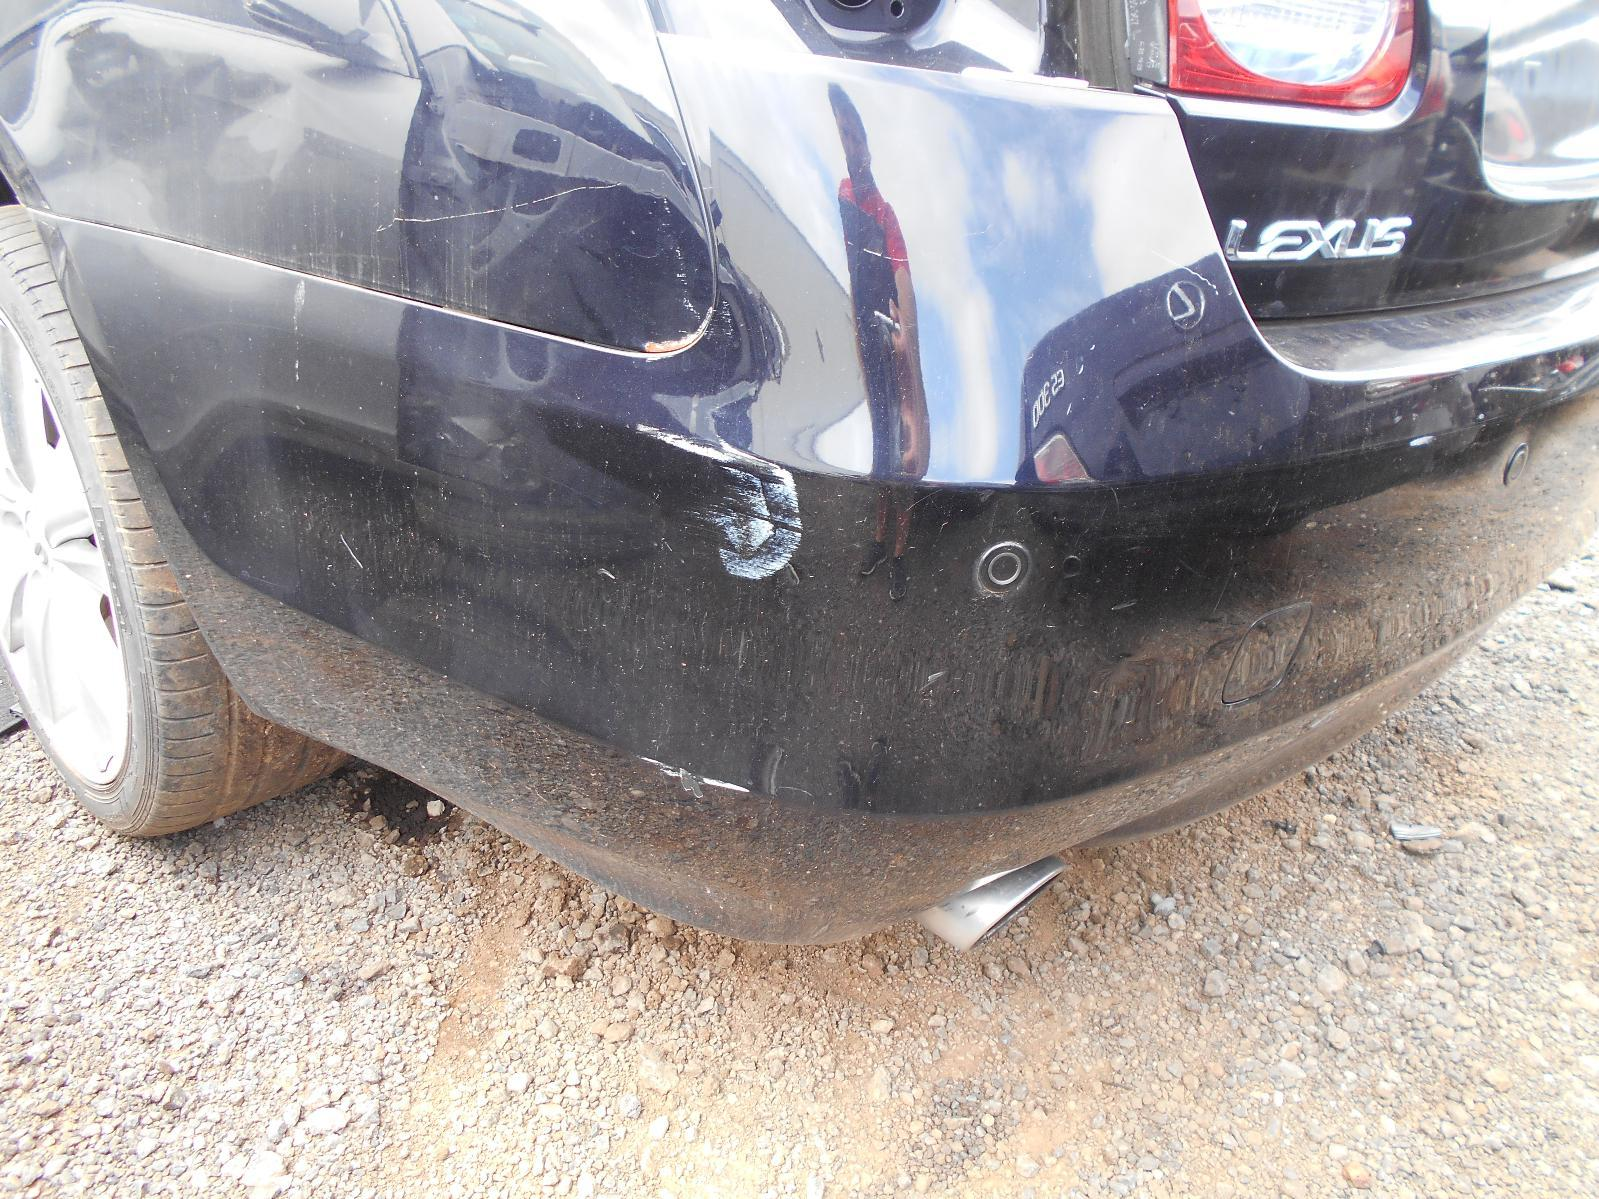 LEXUS GS, Rear Bumper, 190 SERIES, 02/08-12/11